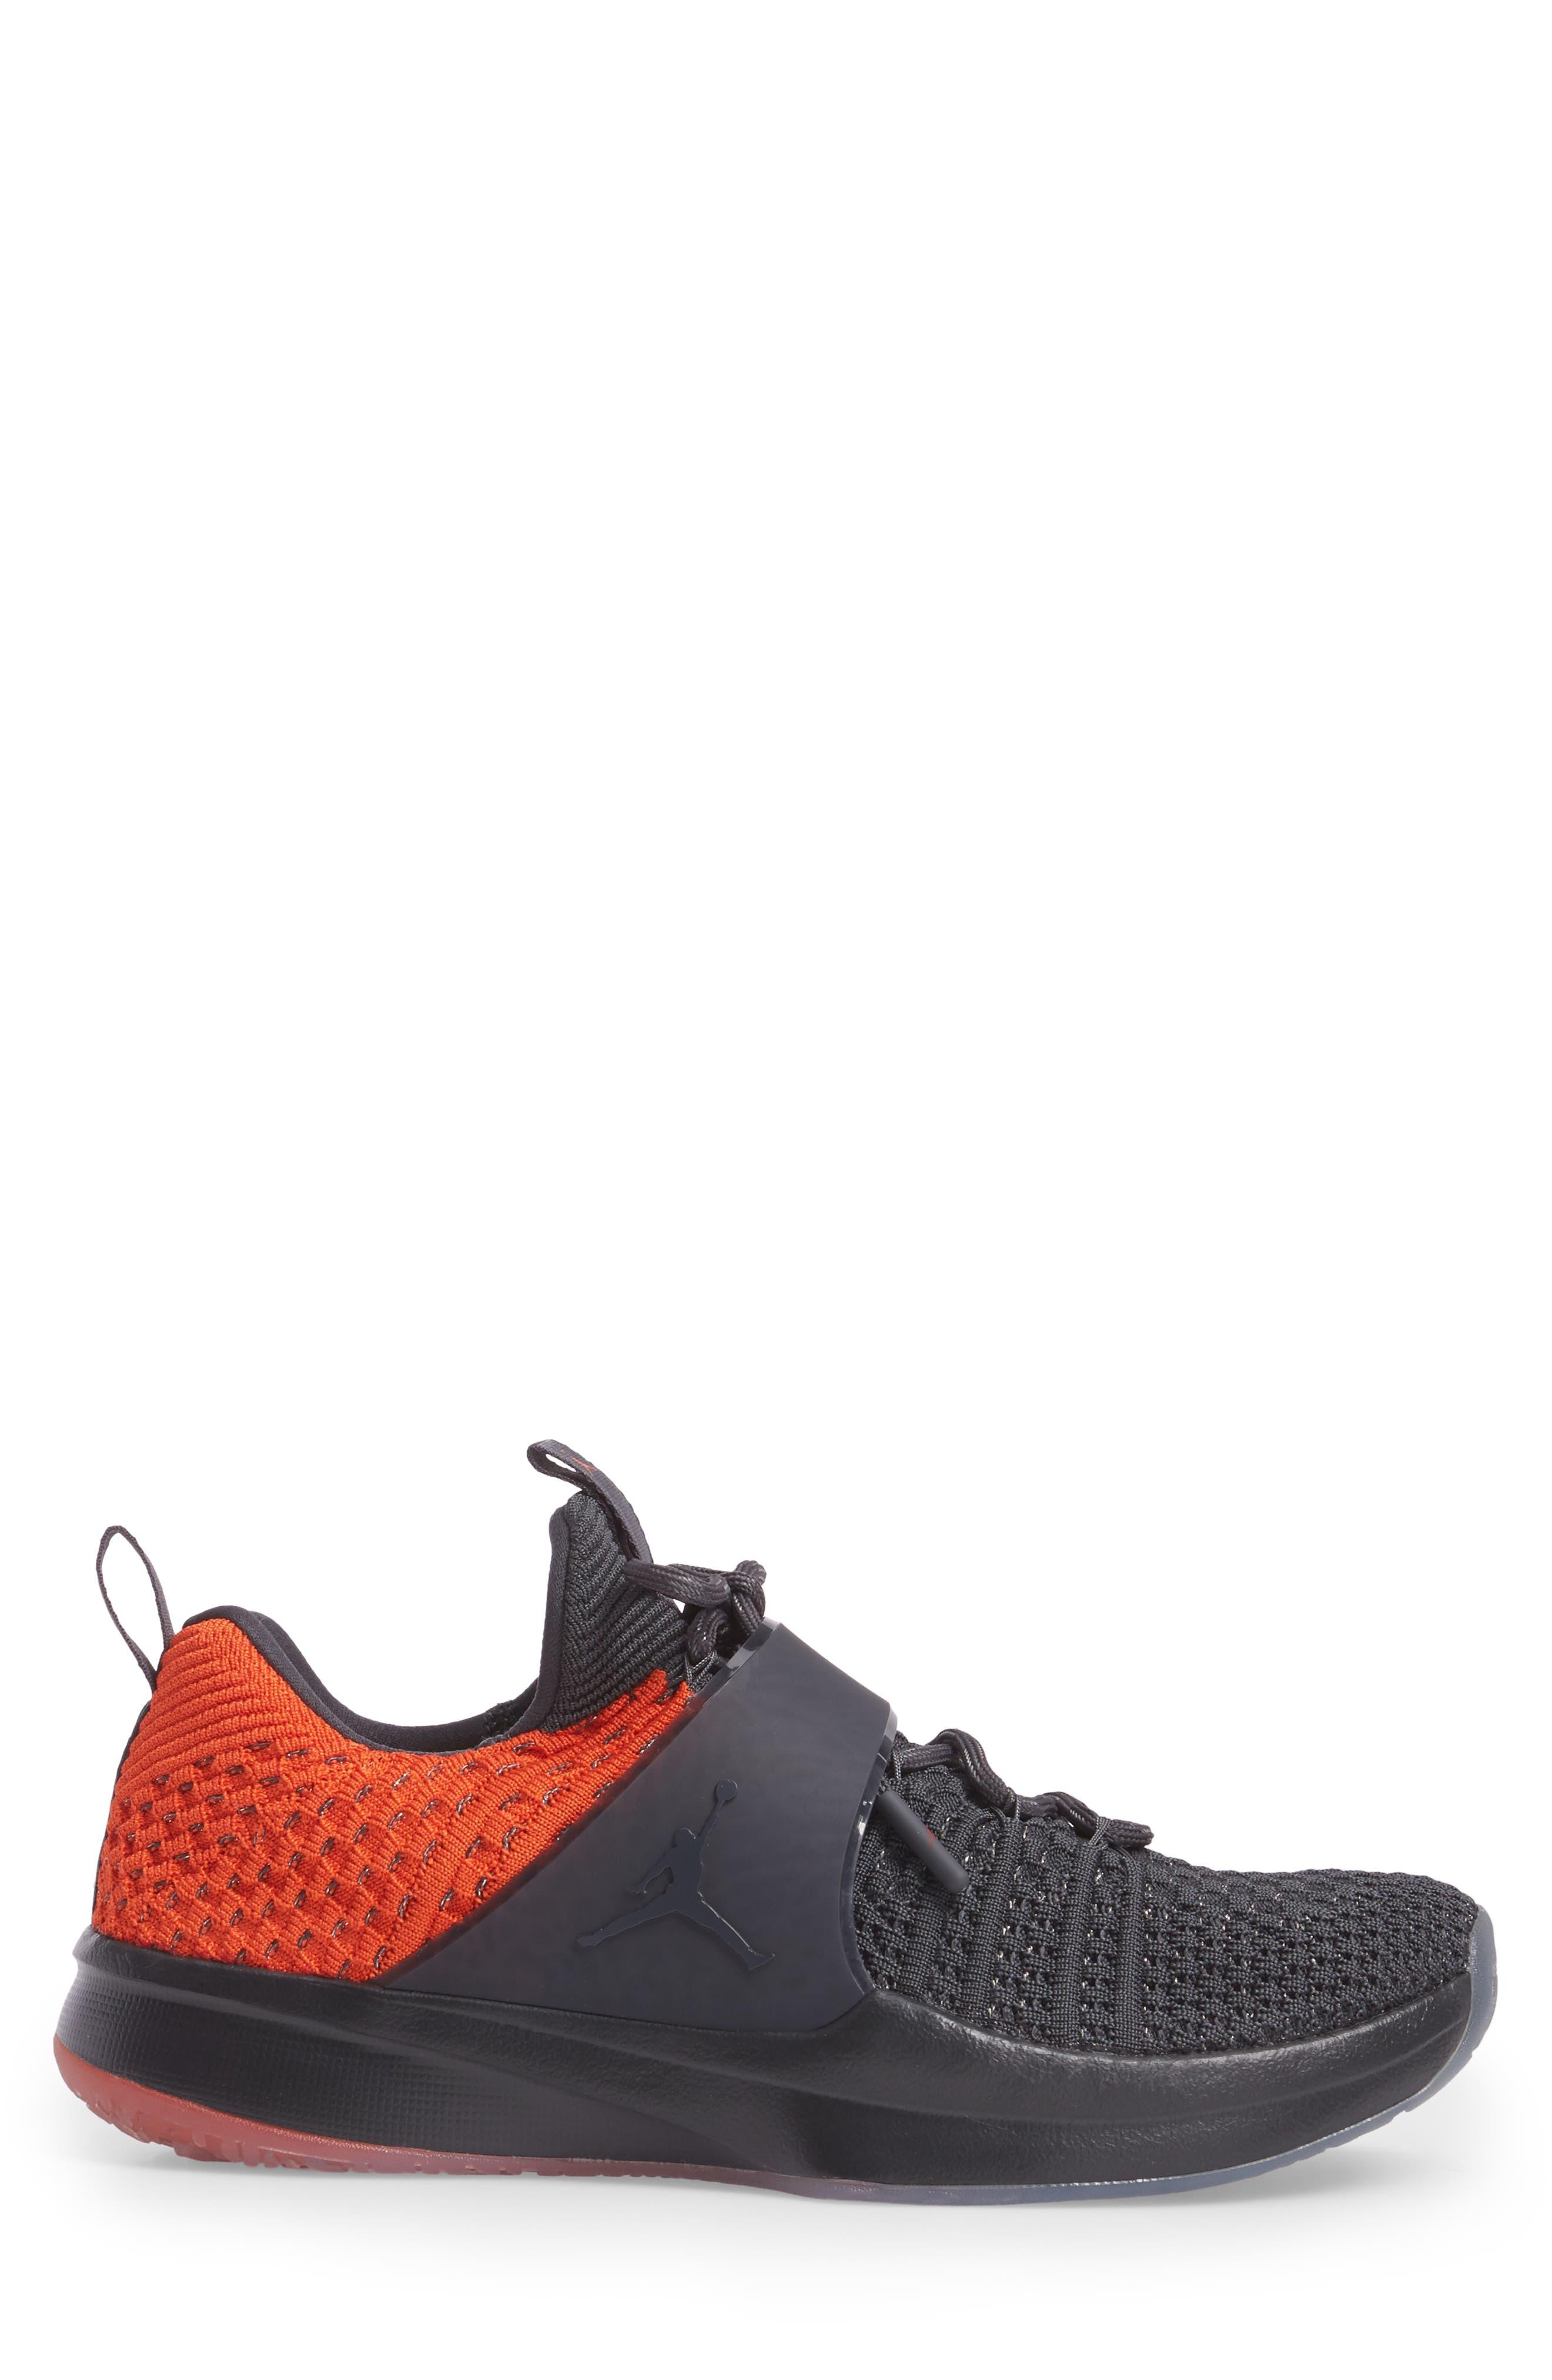 Jordan Flyknit Trainer 2 Low Sneaker,                             Alternate thumbnail 12, color,